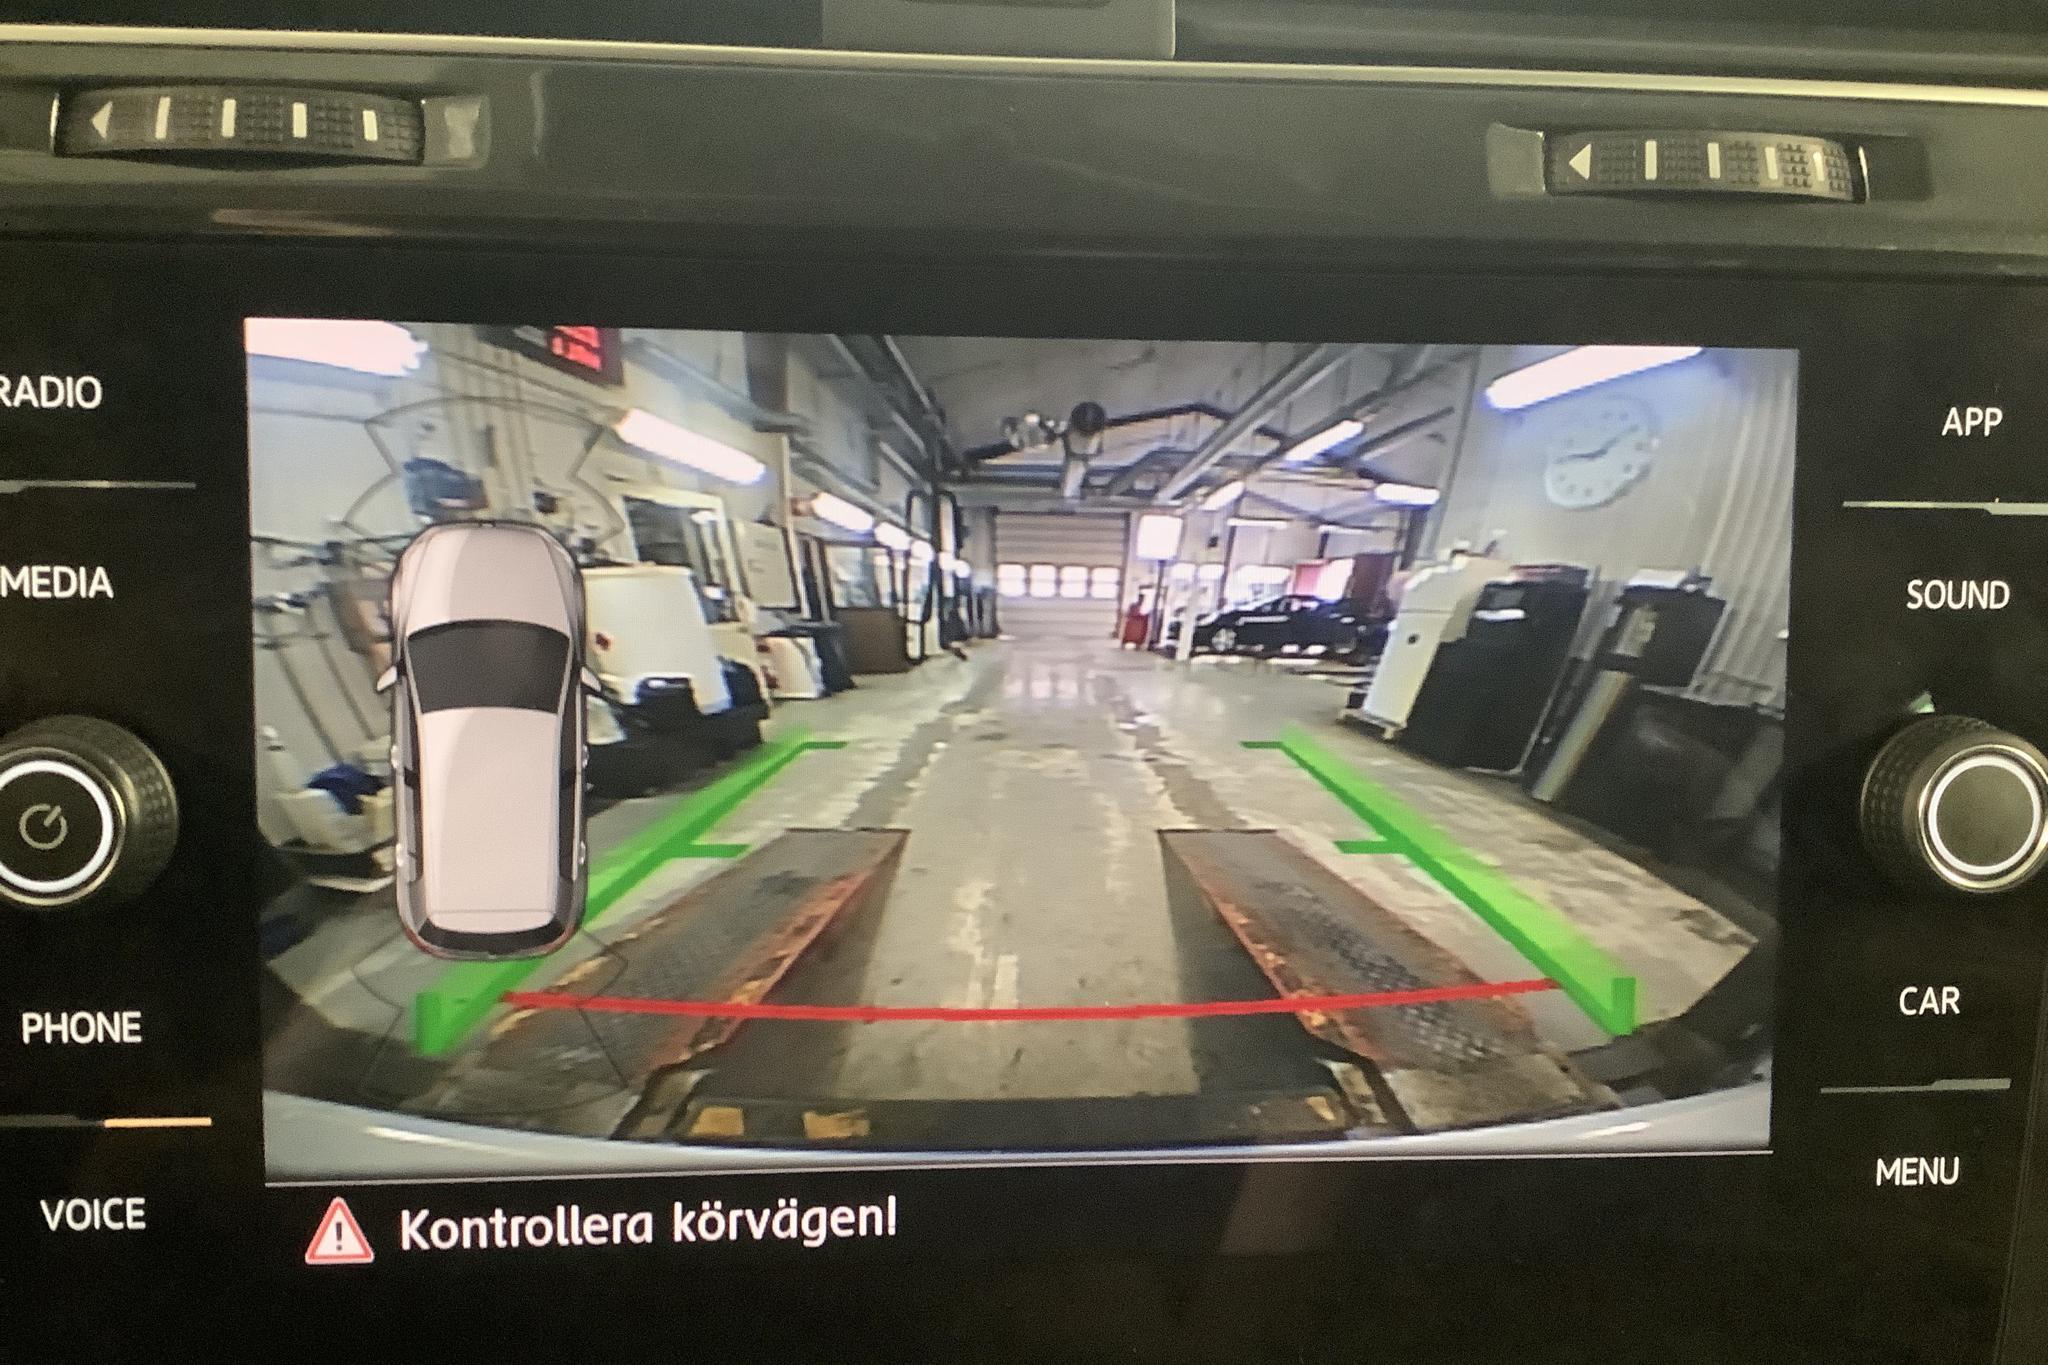 VW Golf VII 1.0 TSI 5dr (110hk) - 3 646 mil - Manuell - vit - 2018